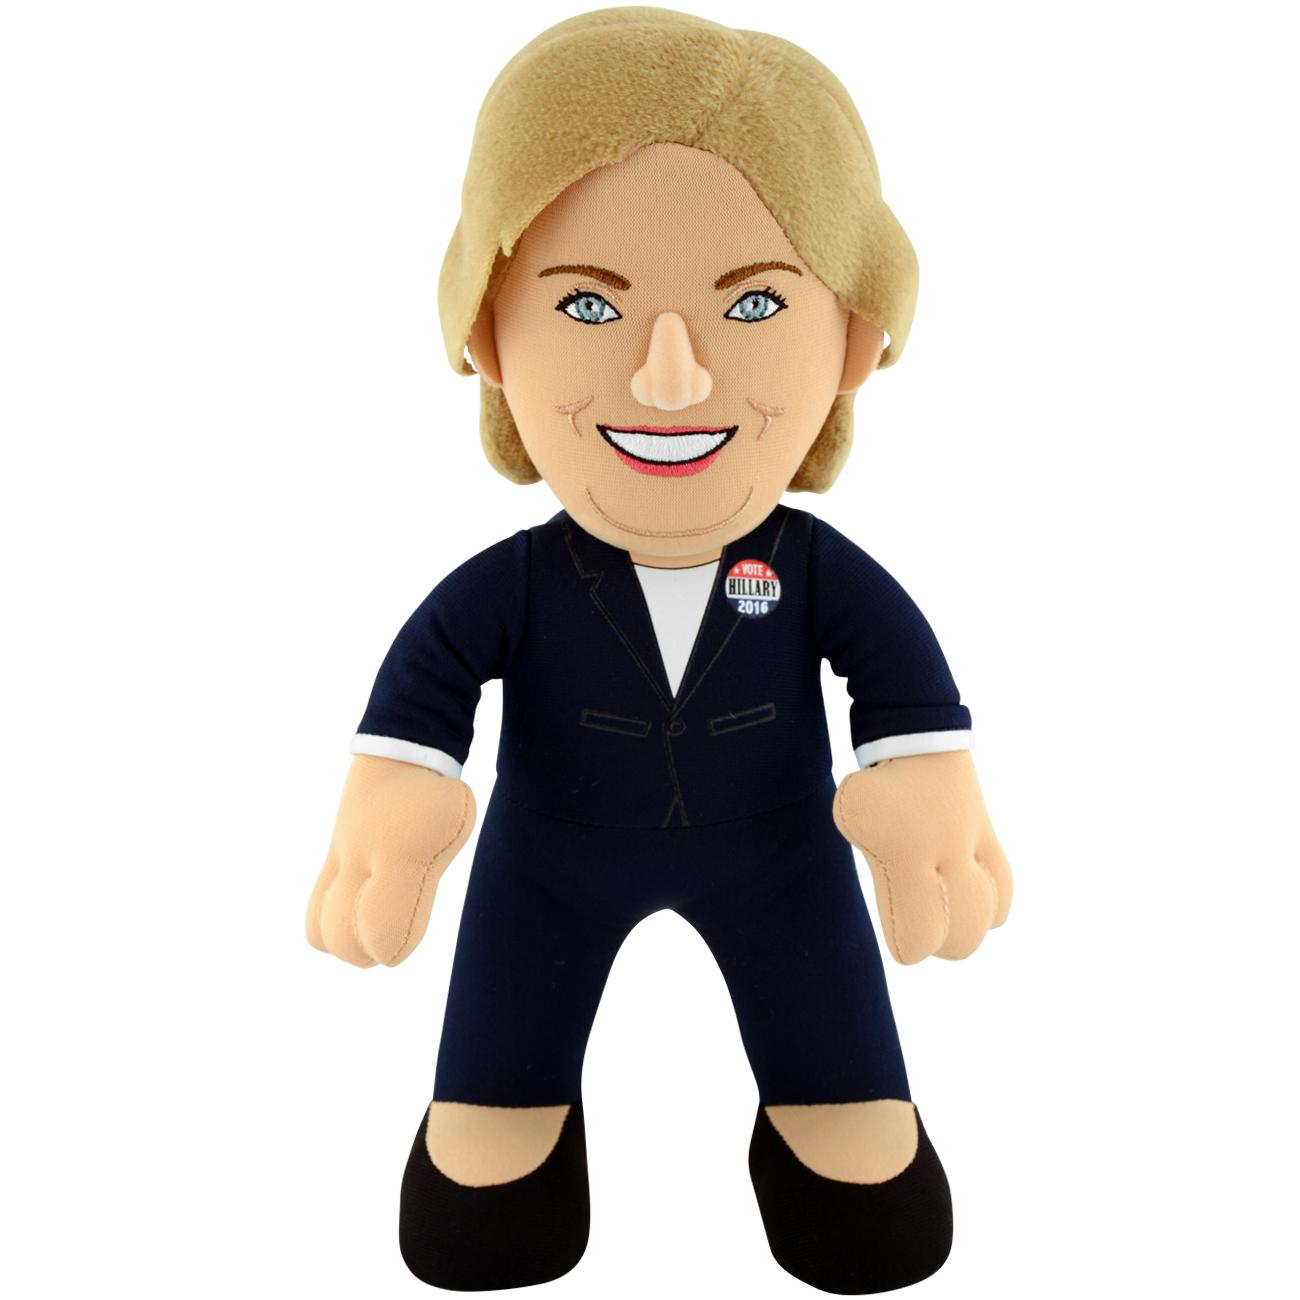 "Historical 10"" Plush Figure Hillary Clinton"